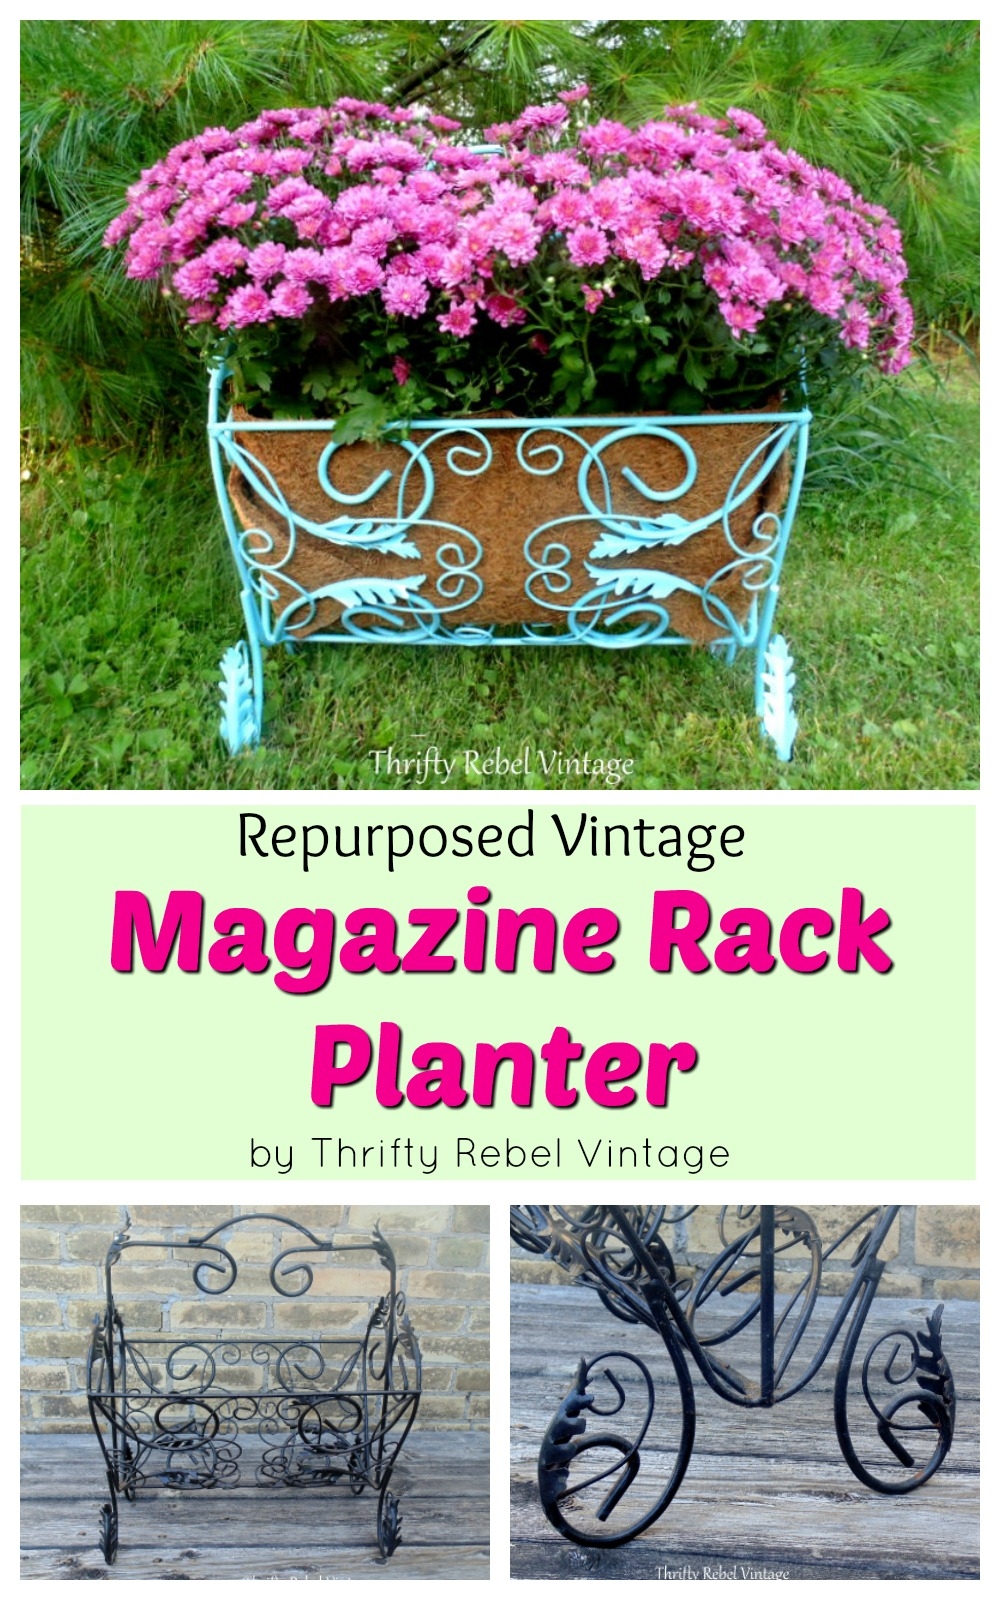 Repurposed vintage Magazine rack planter collage